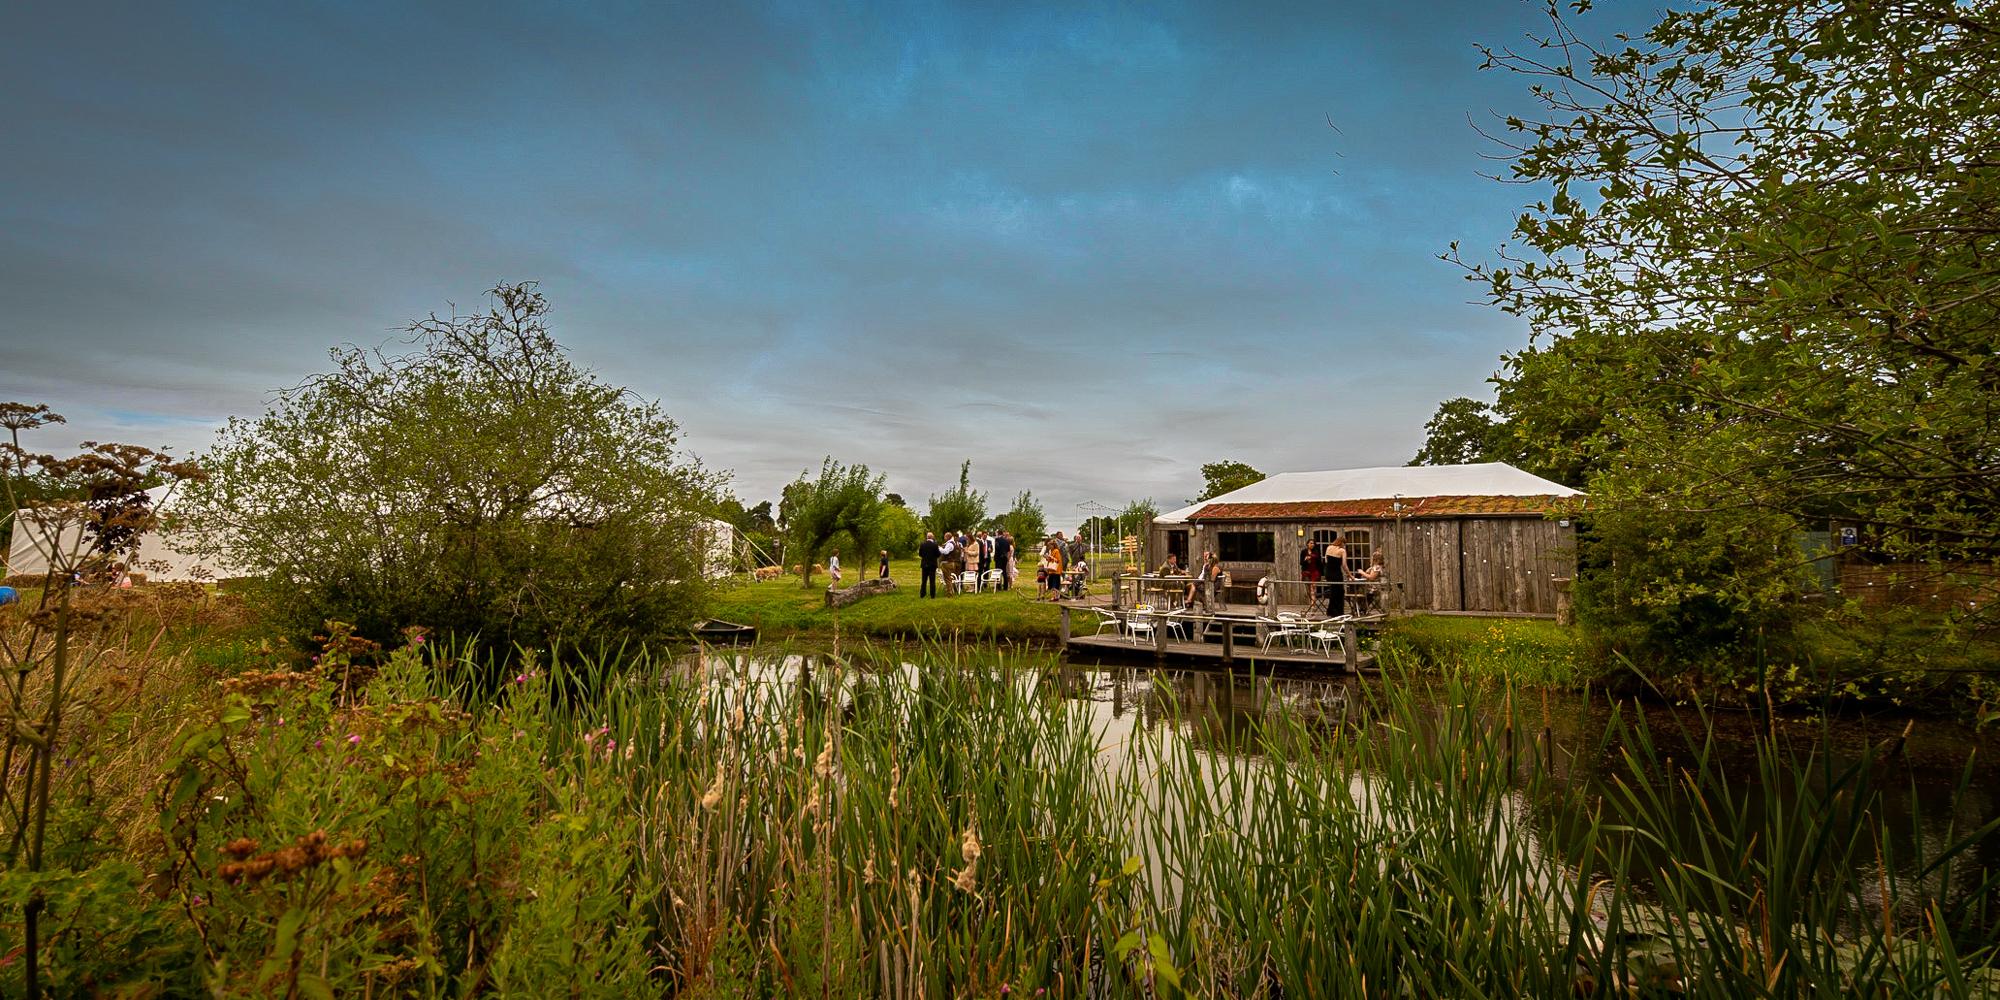 The Pond & Bar